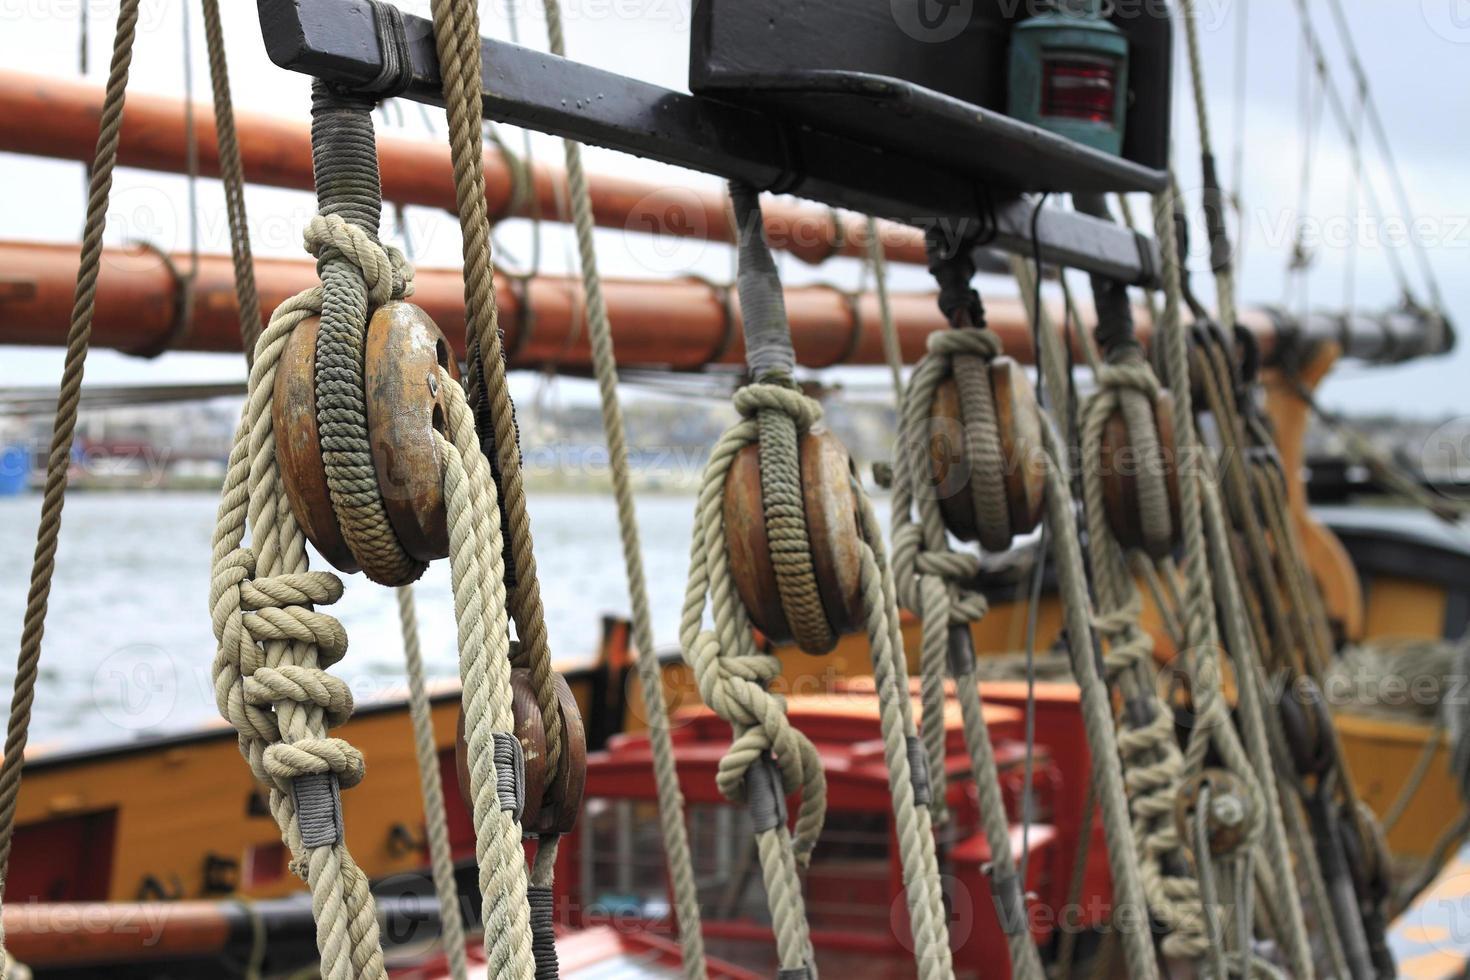 cordage voilier photo